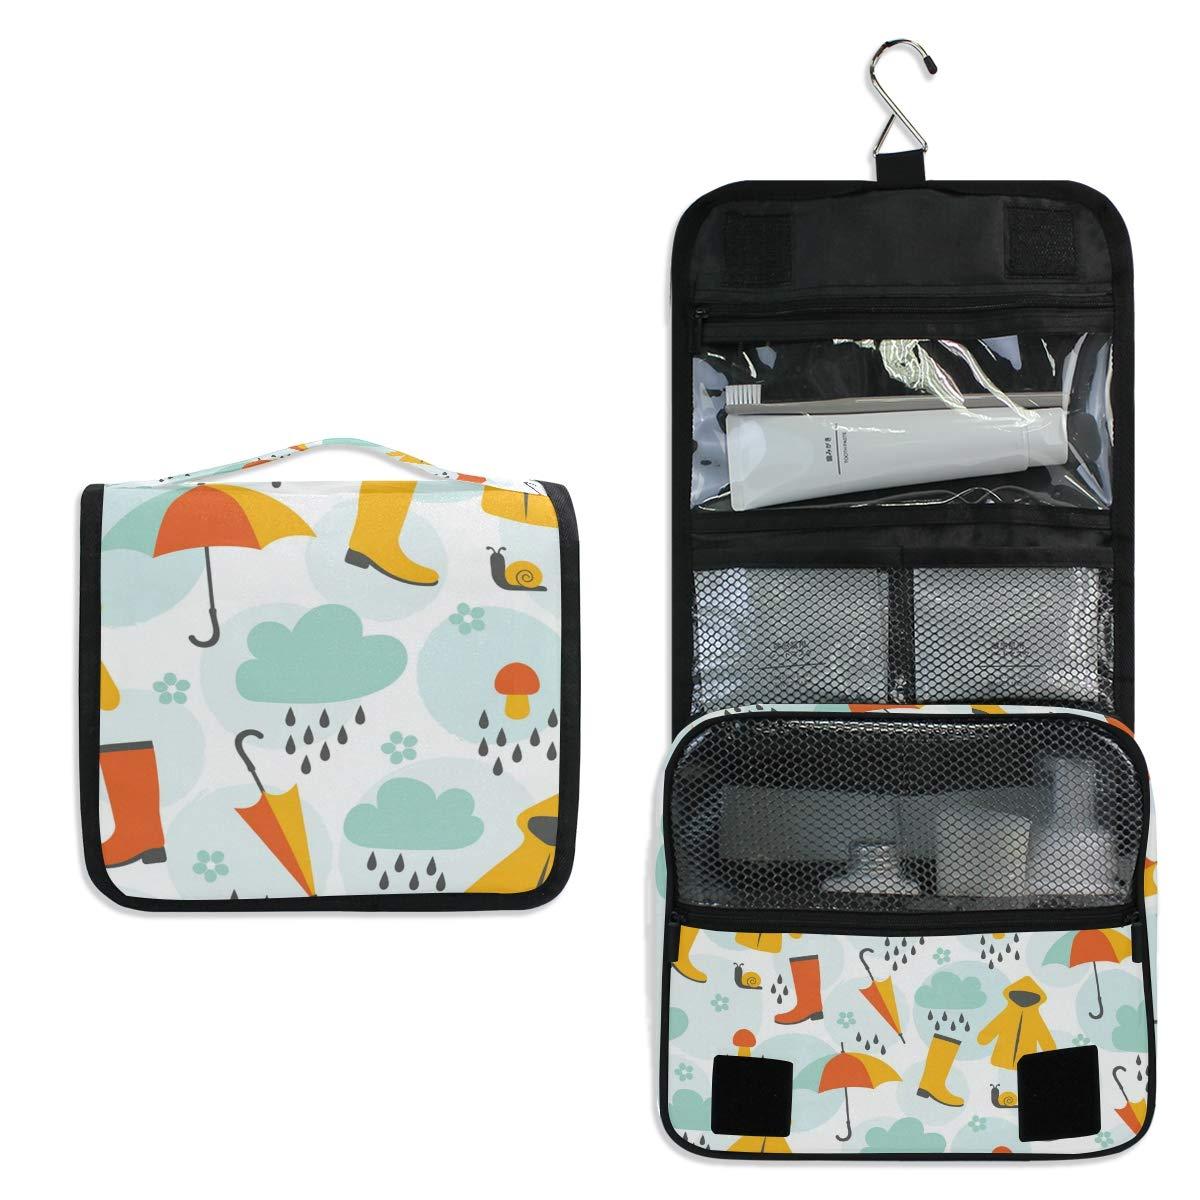 Toiletry Bag Travel Bag Hanging Hook - Cute April Rain Waterproof Cosmetic Bag Portable Makeup Pouch for Bathroom Toiletries